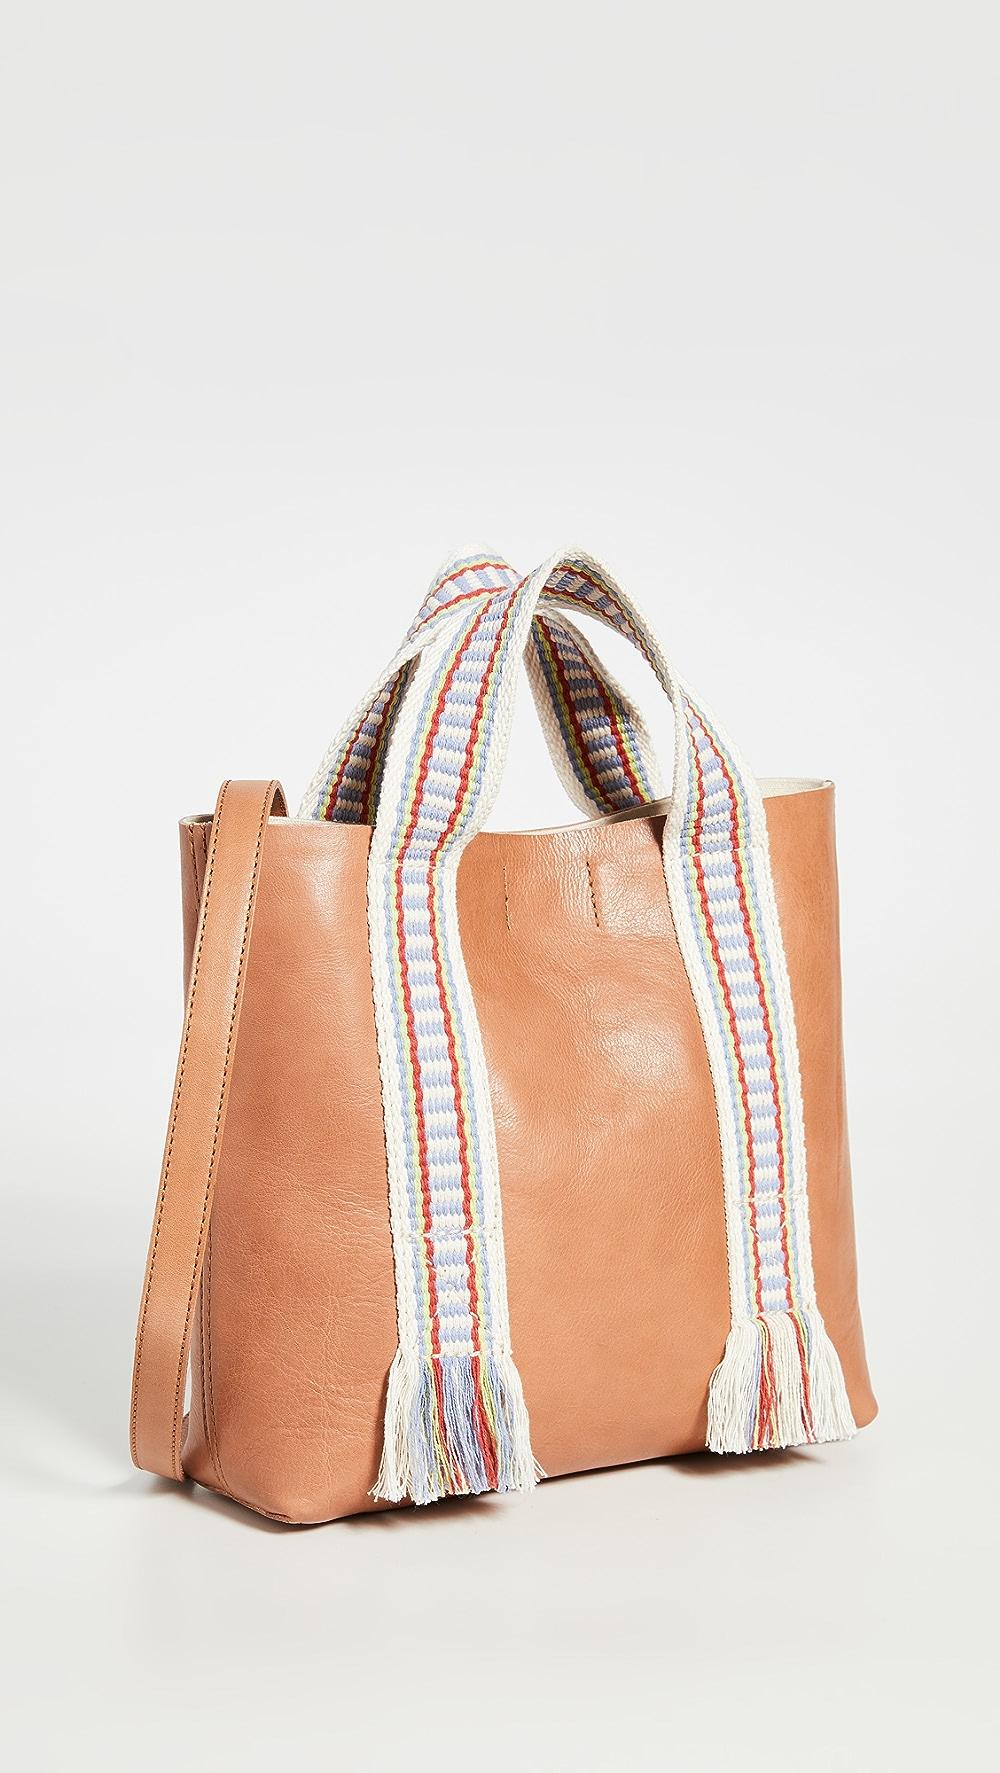 Modest Madewell - Transport Inset Zip Crossbody Bag Jade White